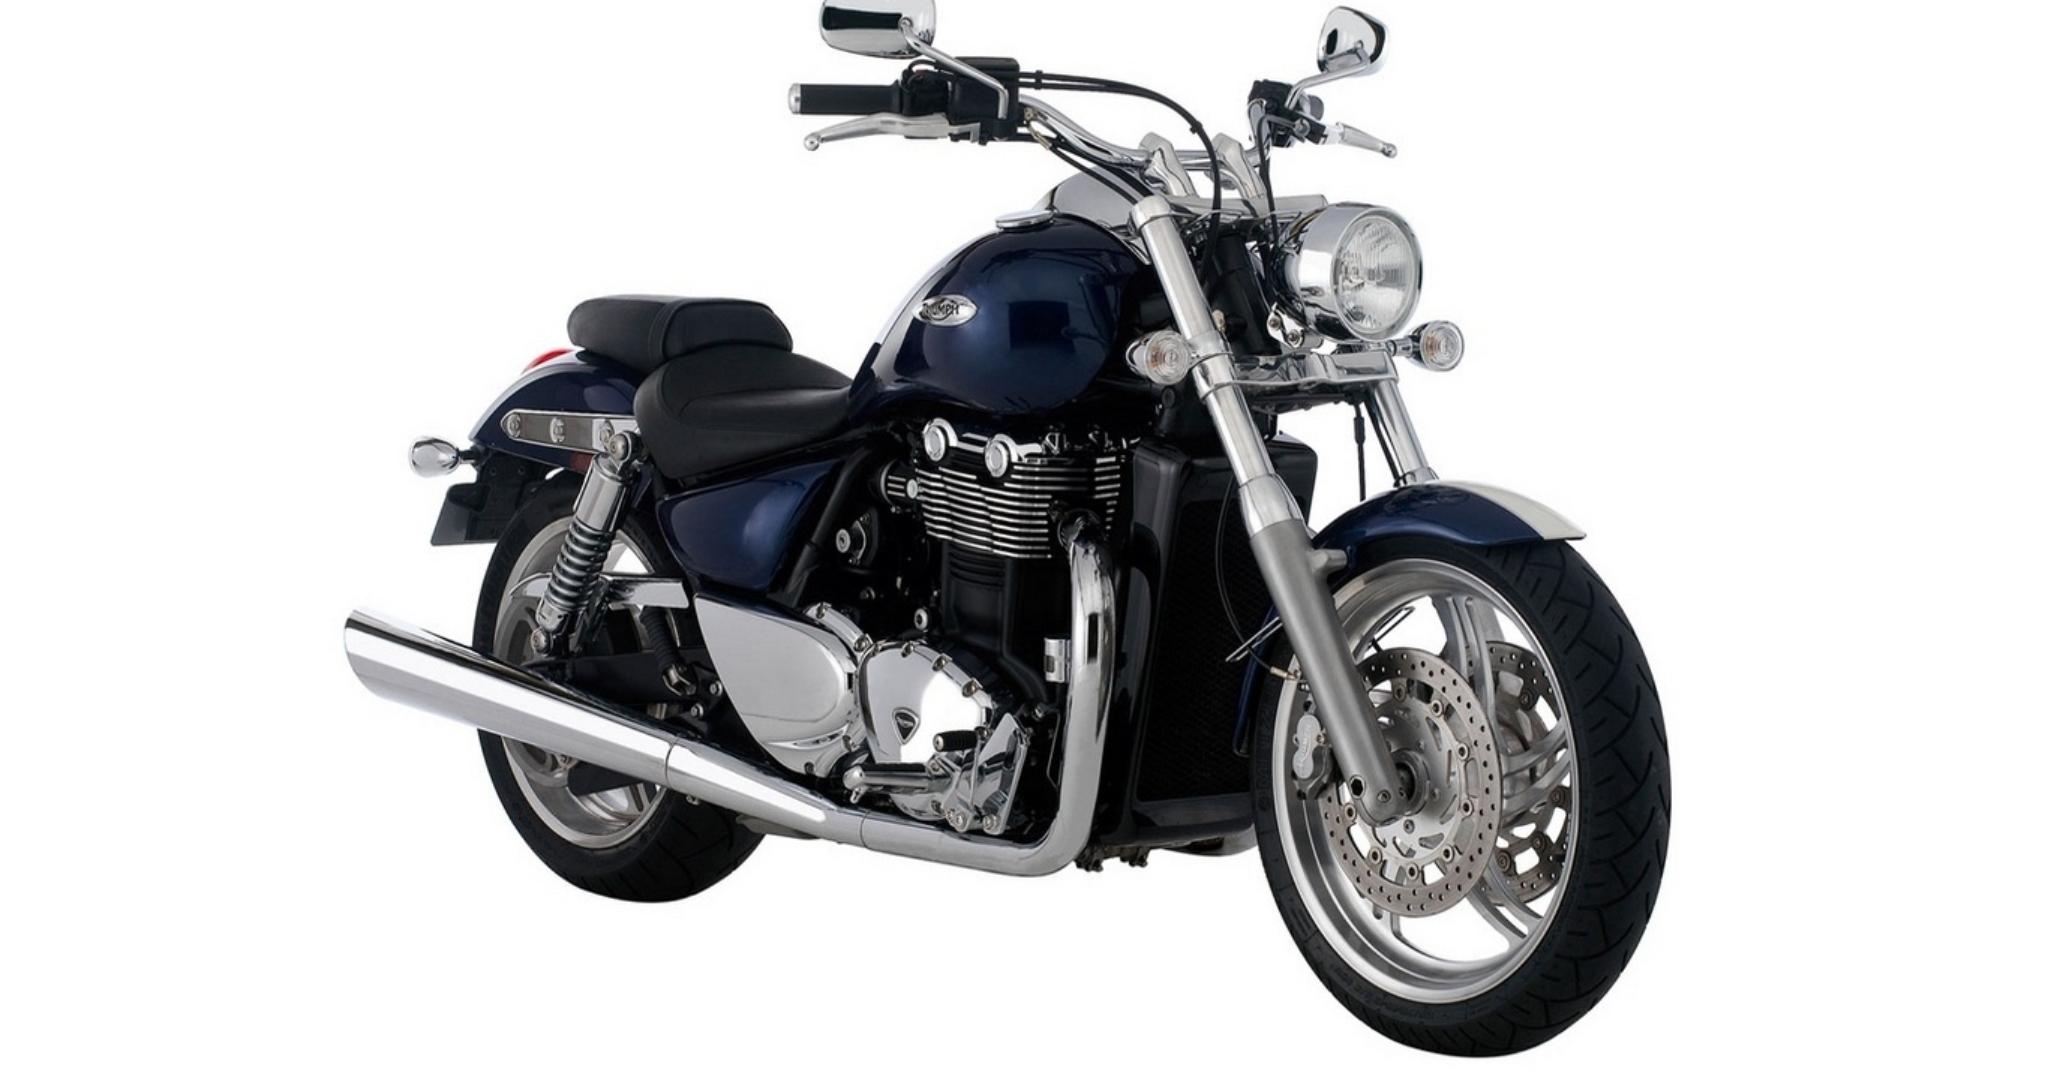 Обои Thunderbird, Triumph, bike. Мотоциклы foto 9